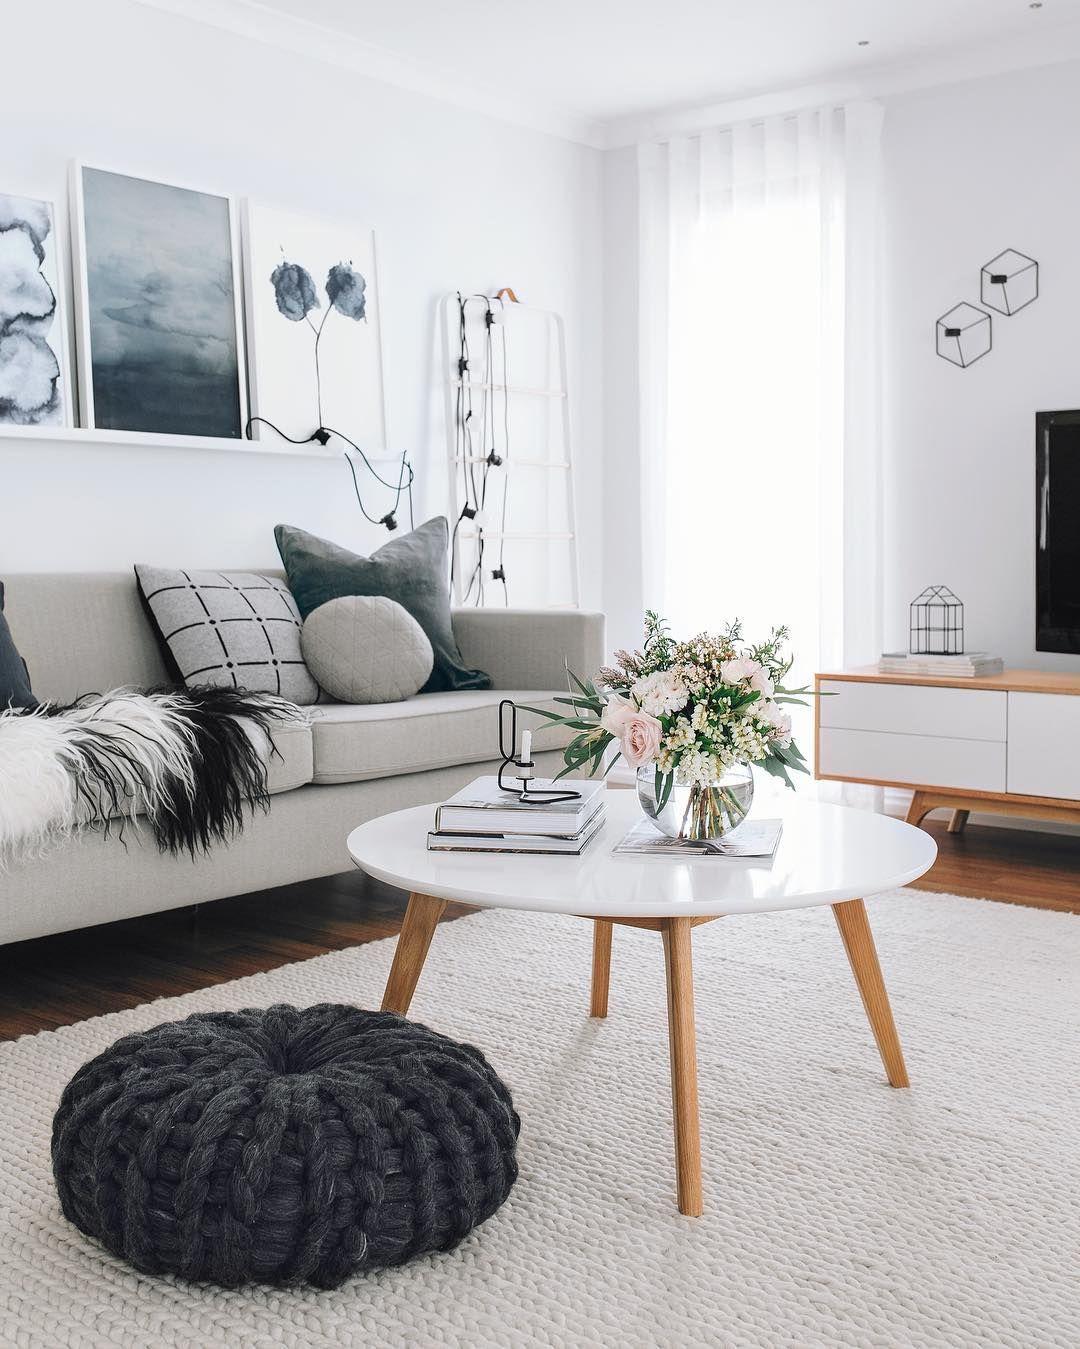 8 Ways to Style Scandinavian Interior Design at Home ...